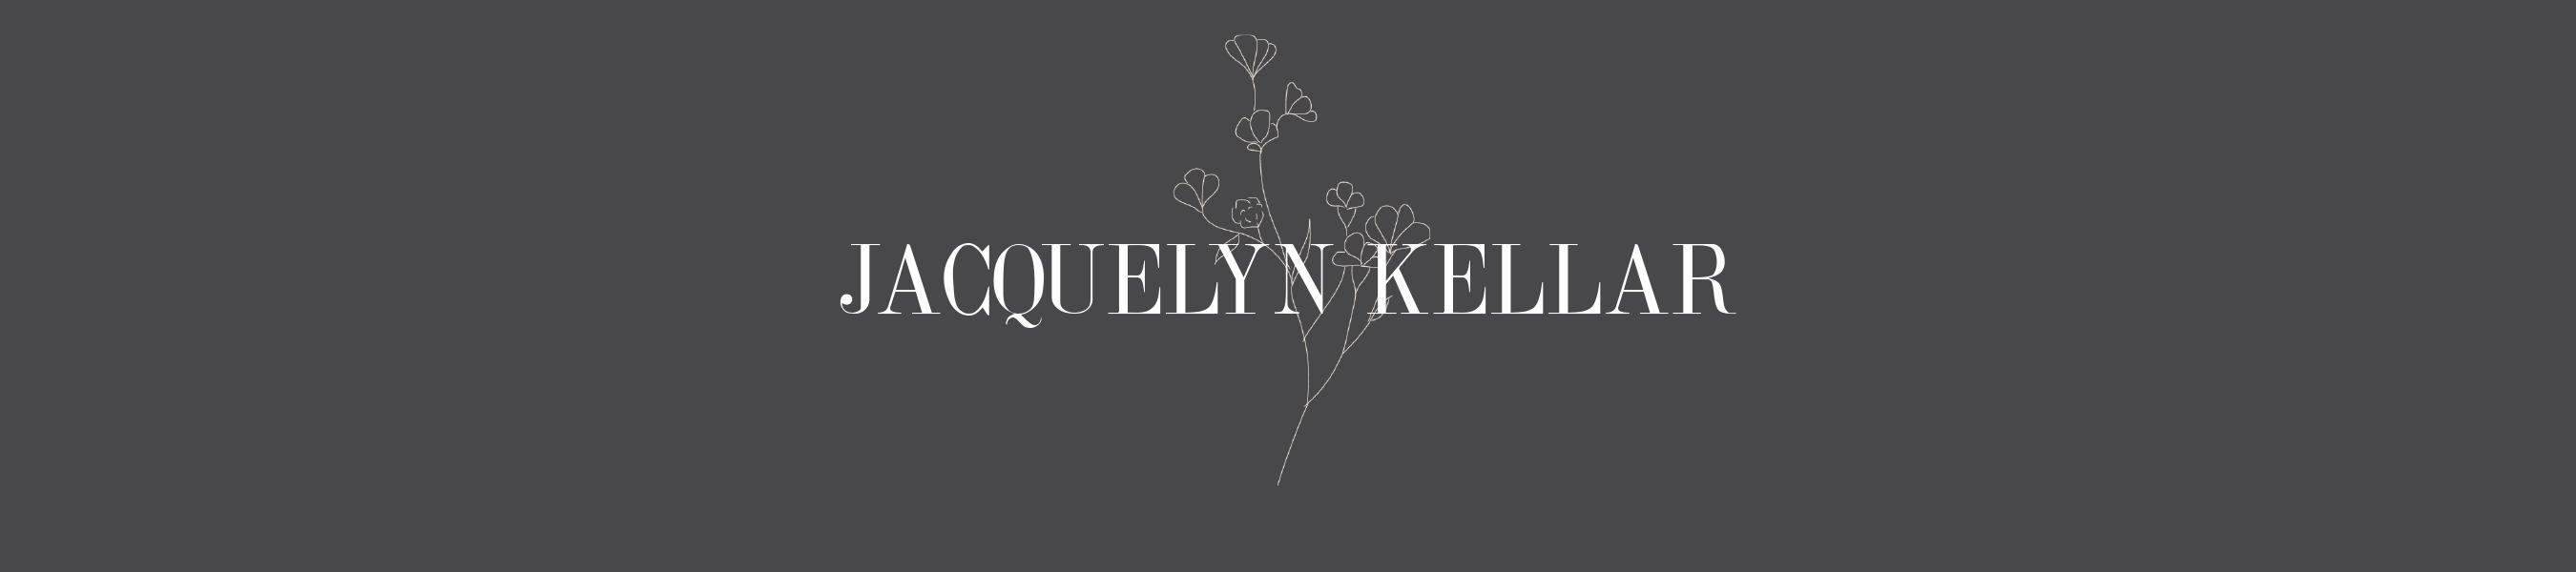 Jacquelyn Kellar